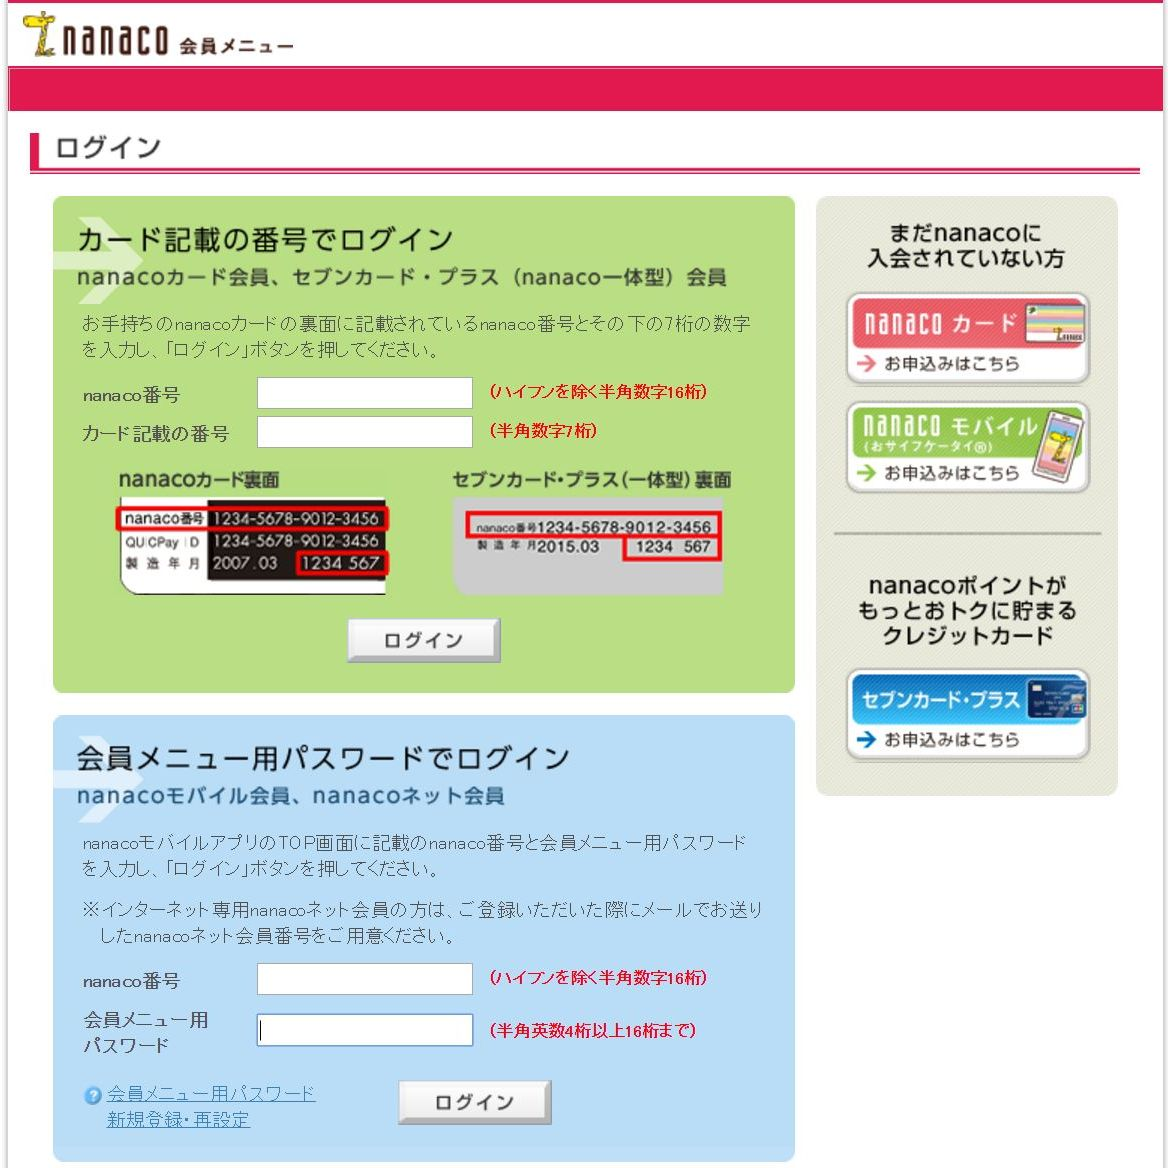 nanacoサイトのログイン画面